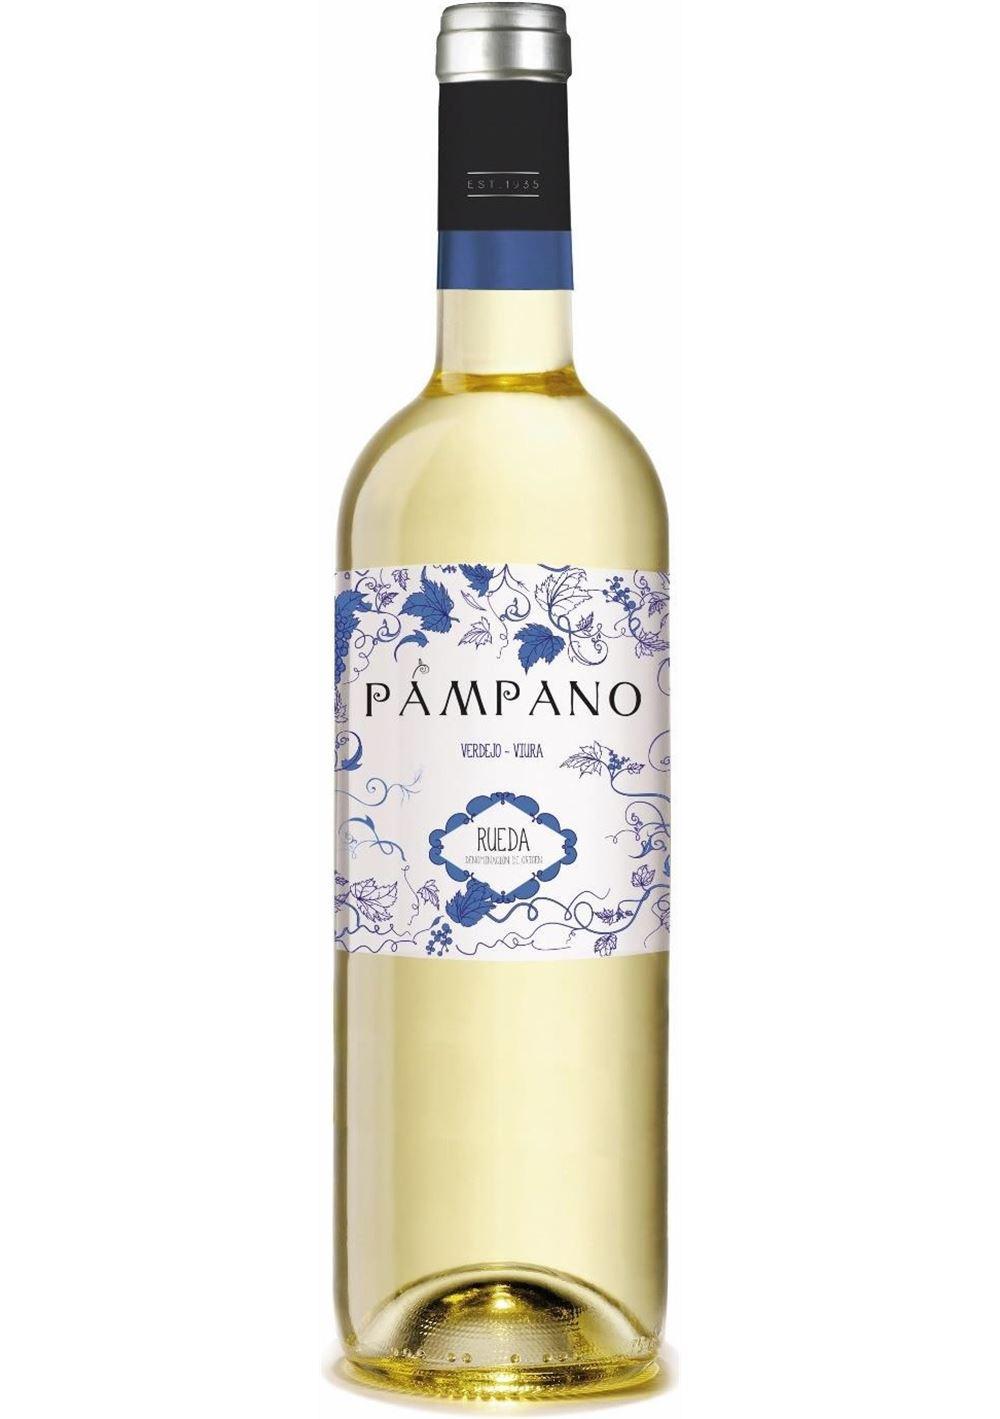 PAMPANORUEDA